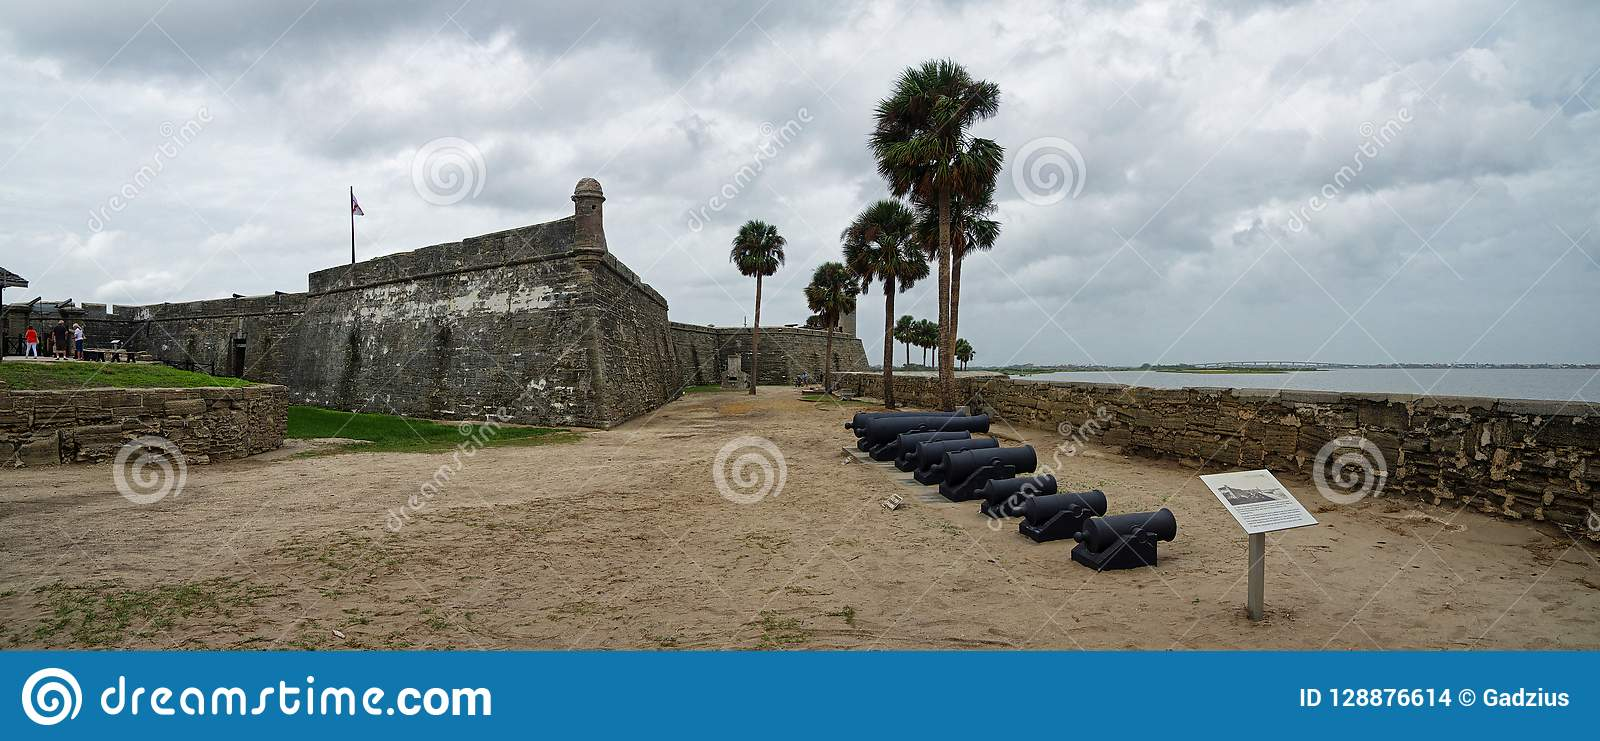 Historical Castillo de San Marcos in St. Augustine, Florida, USA